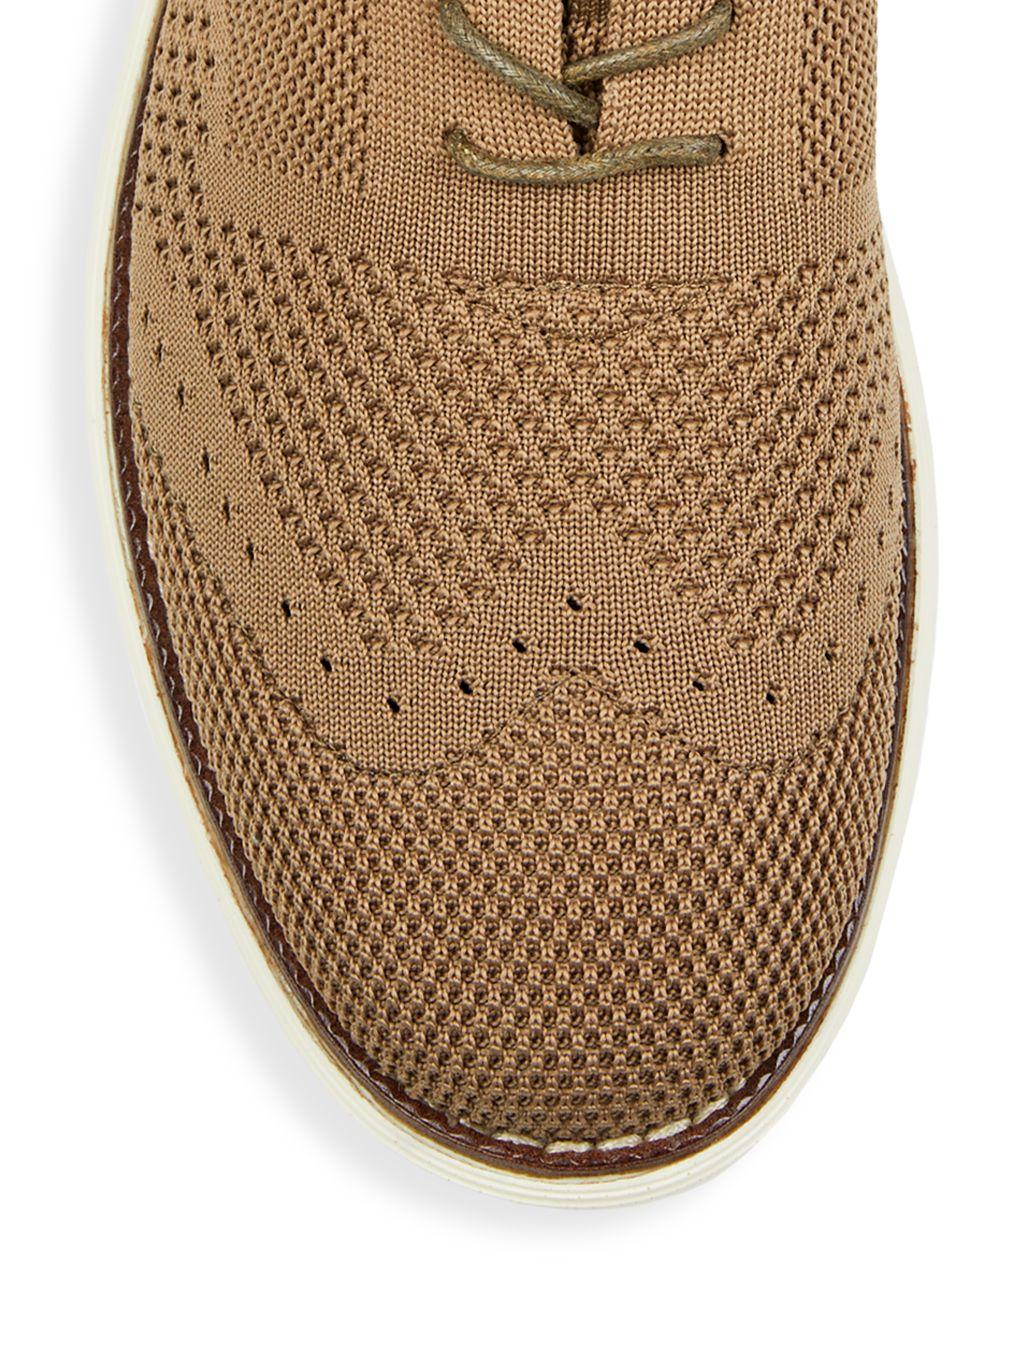 B Blass Textured Knit Oxfords